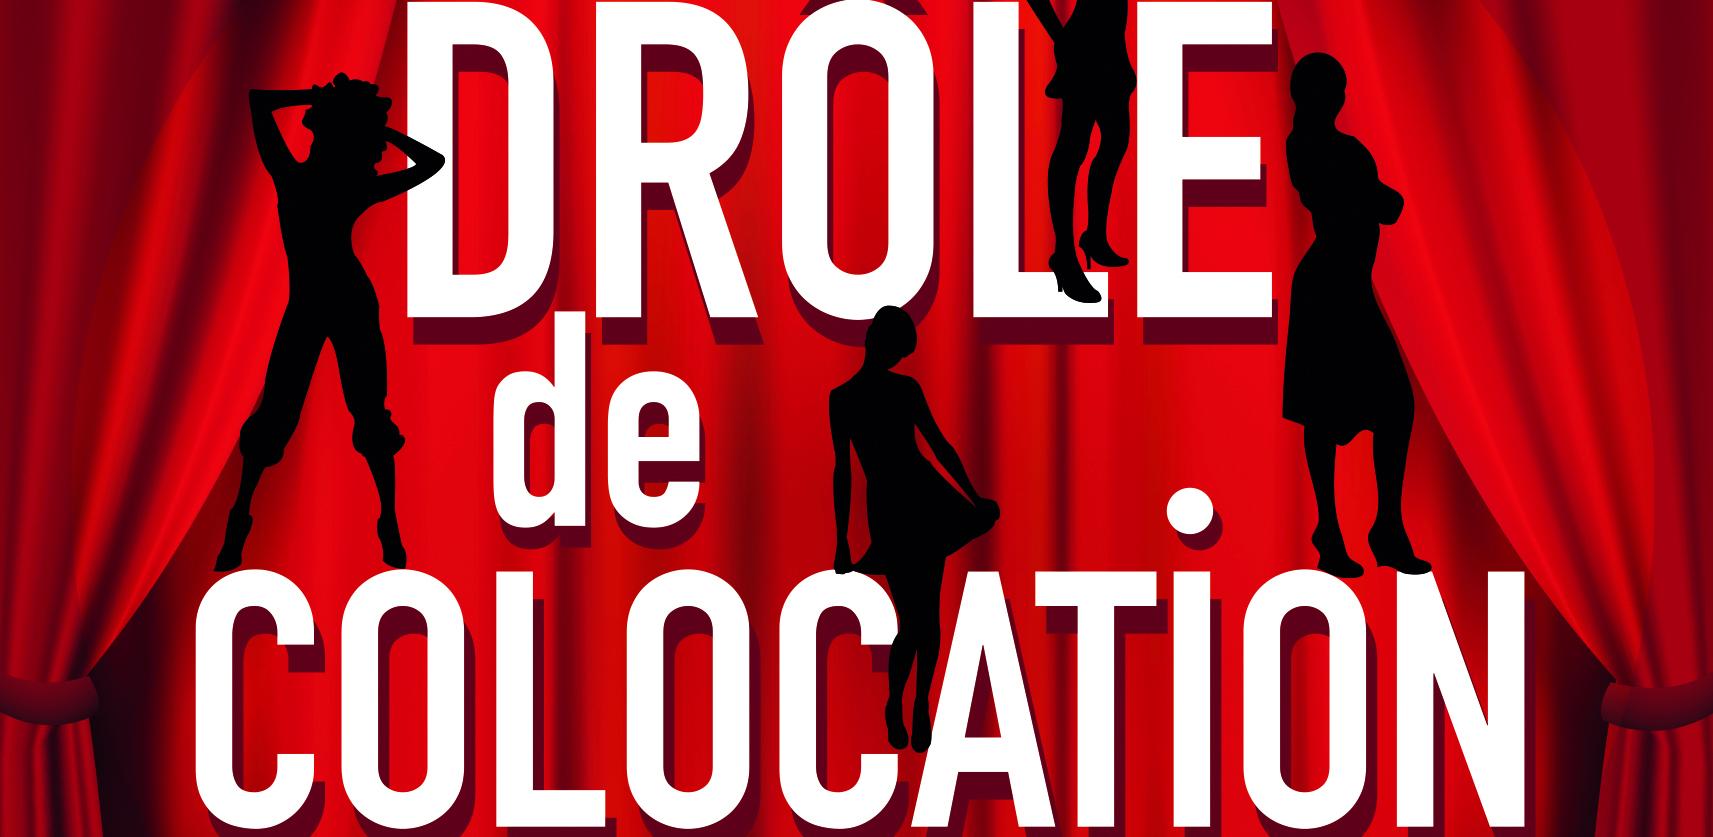 ANNULATION DROLE DE COLOCATION